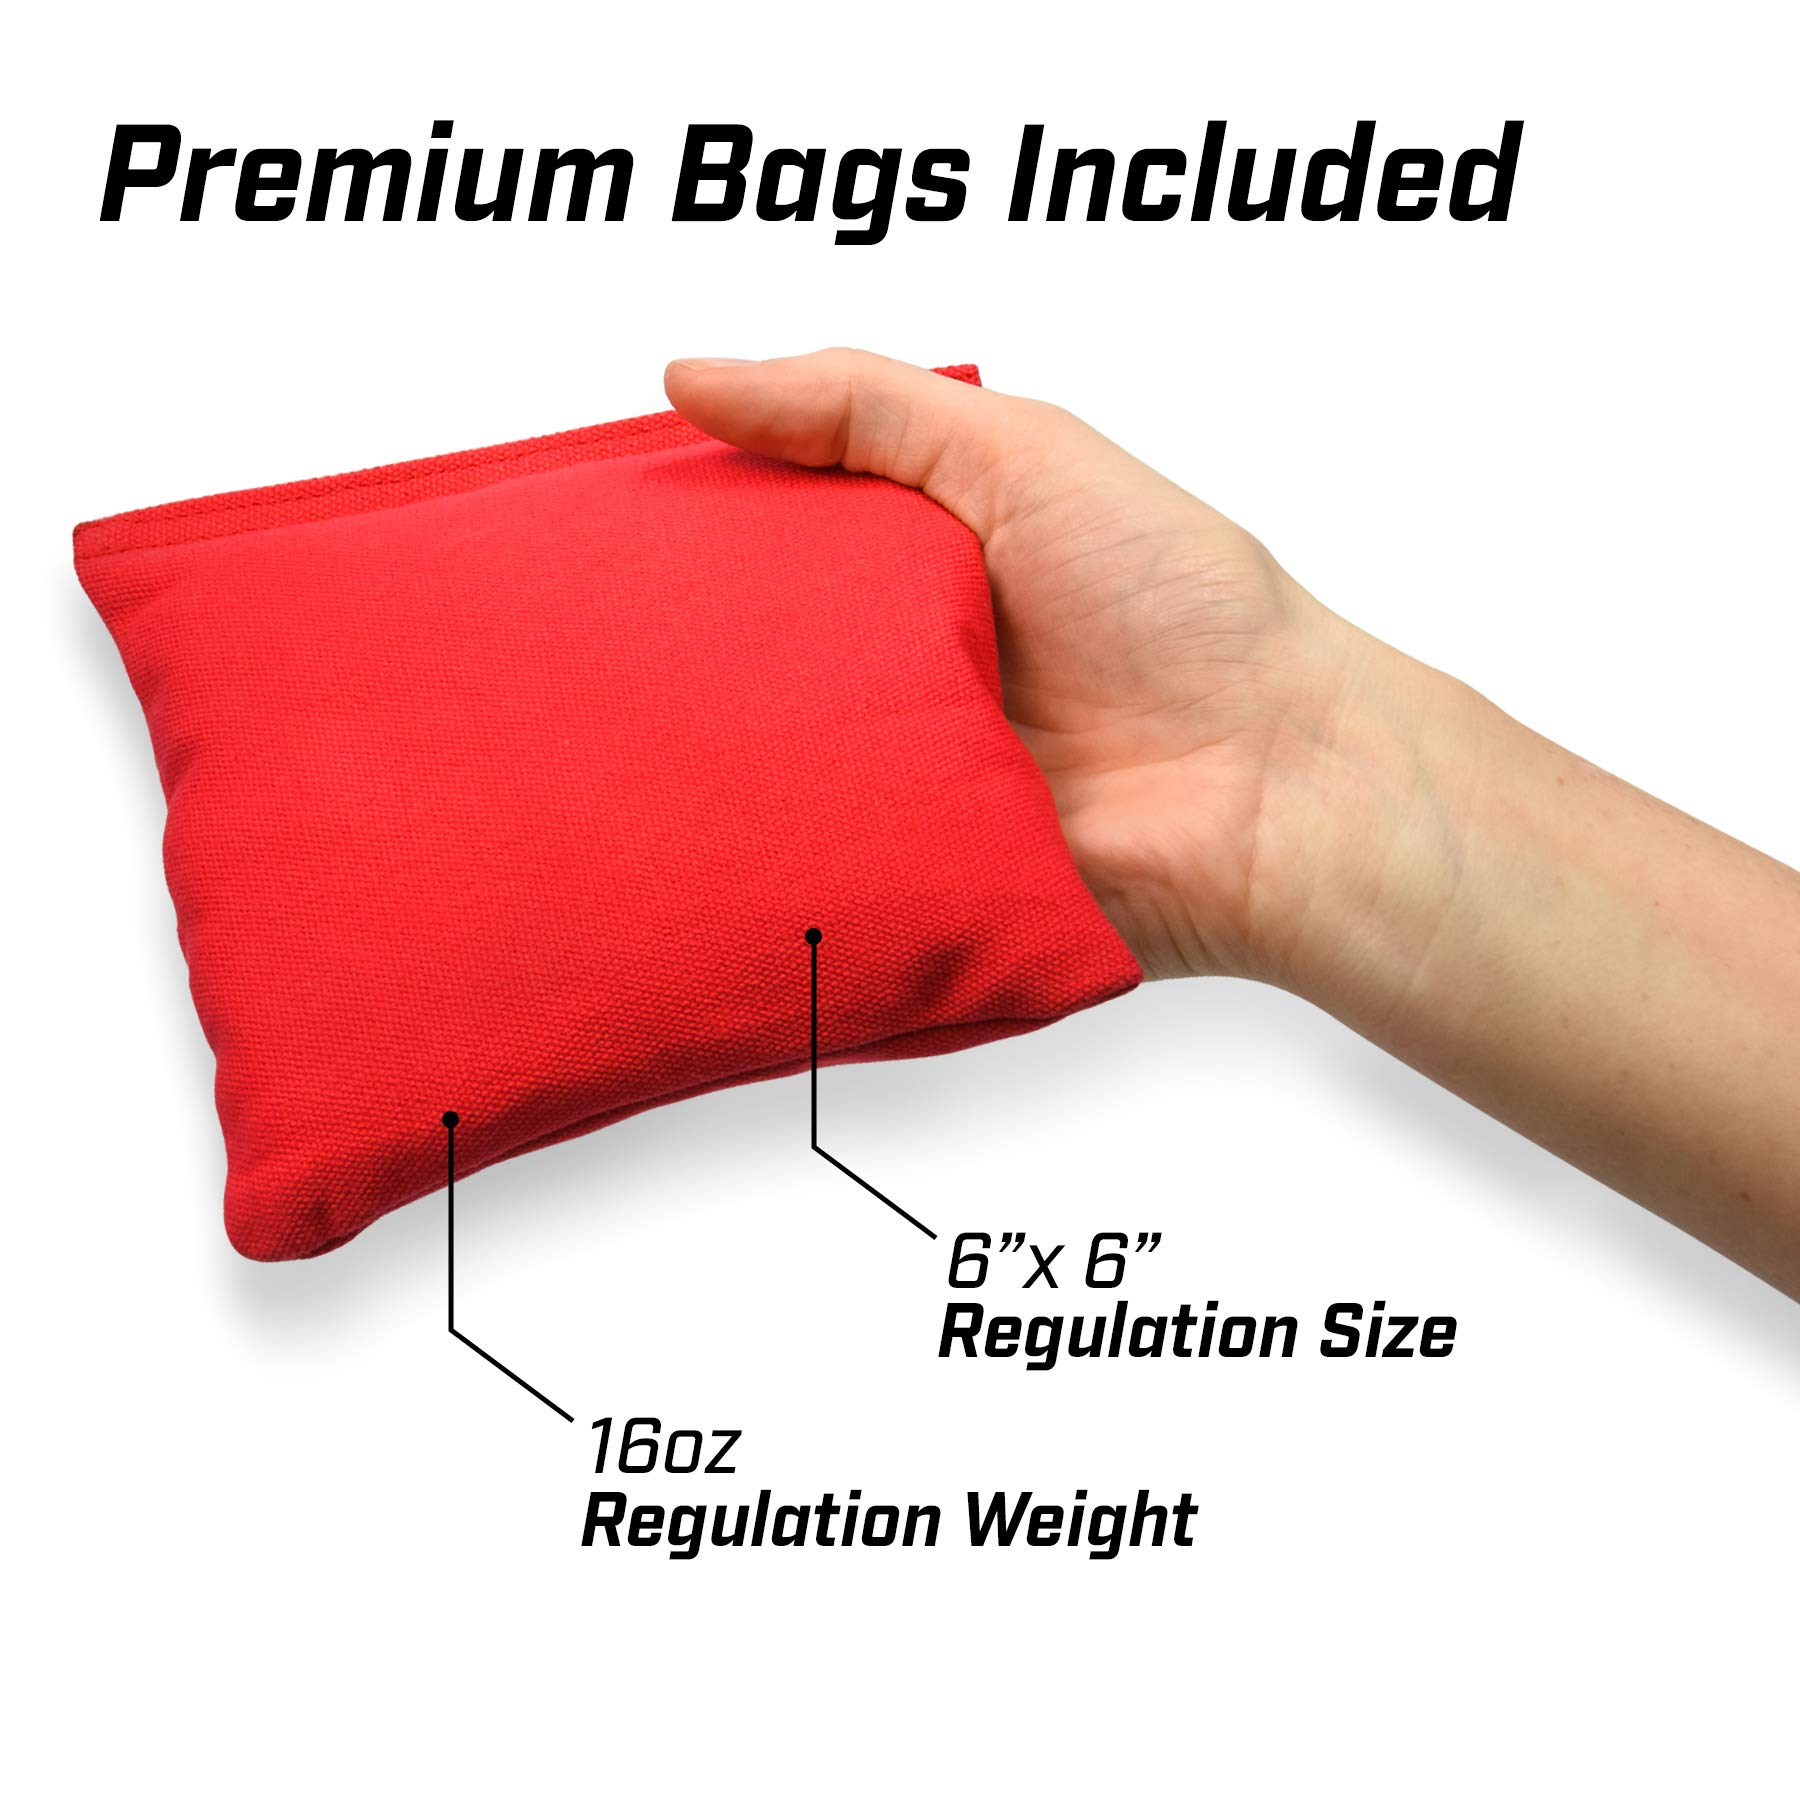 GoSports Bamboo Regulation Size Bamboo Cornhole Set   Includes 8 Bean Bags & Carrying Case by GoSports (Image #4)